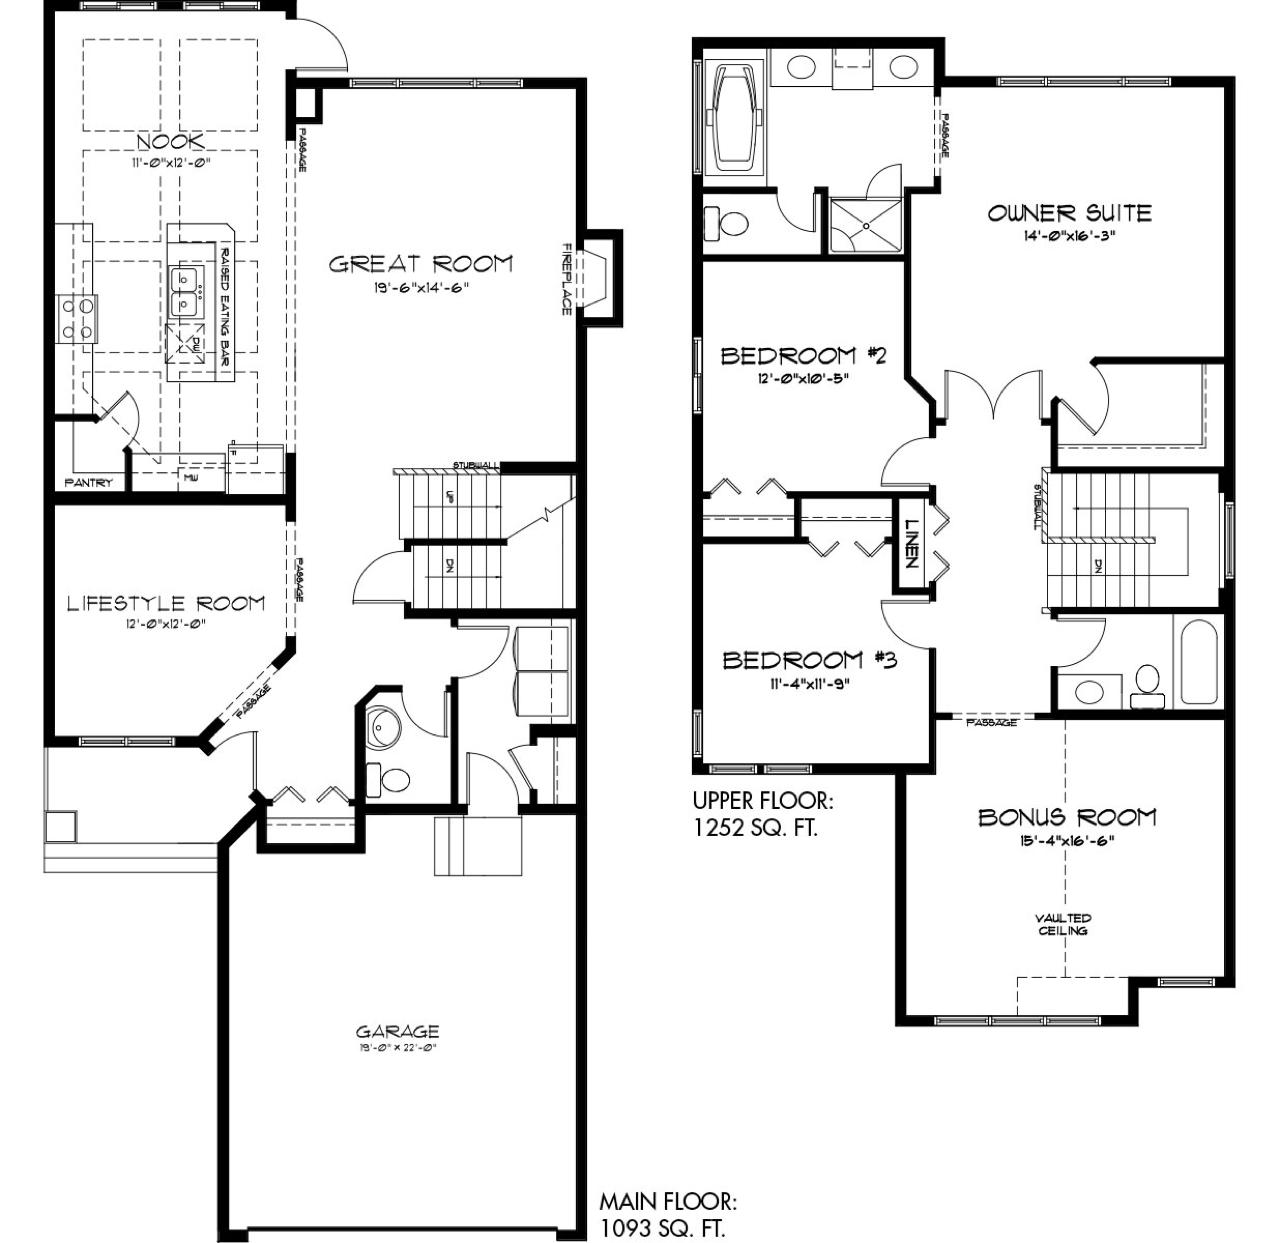 Picturesque Quick Possessions Madison E Floor Plan Image